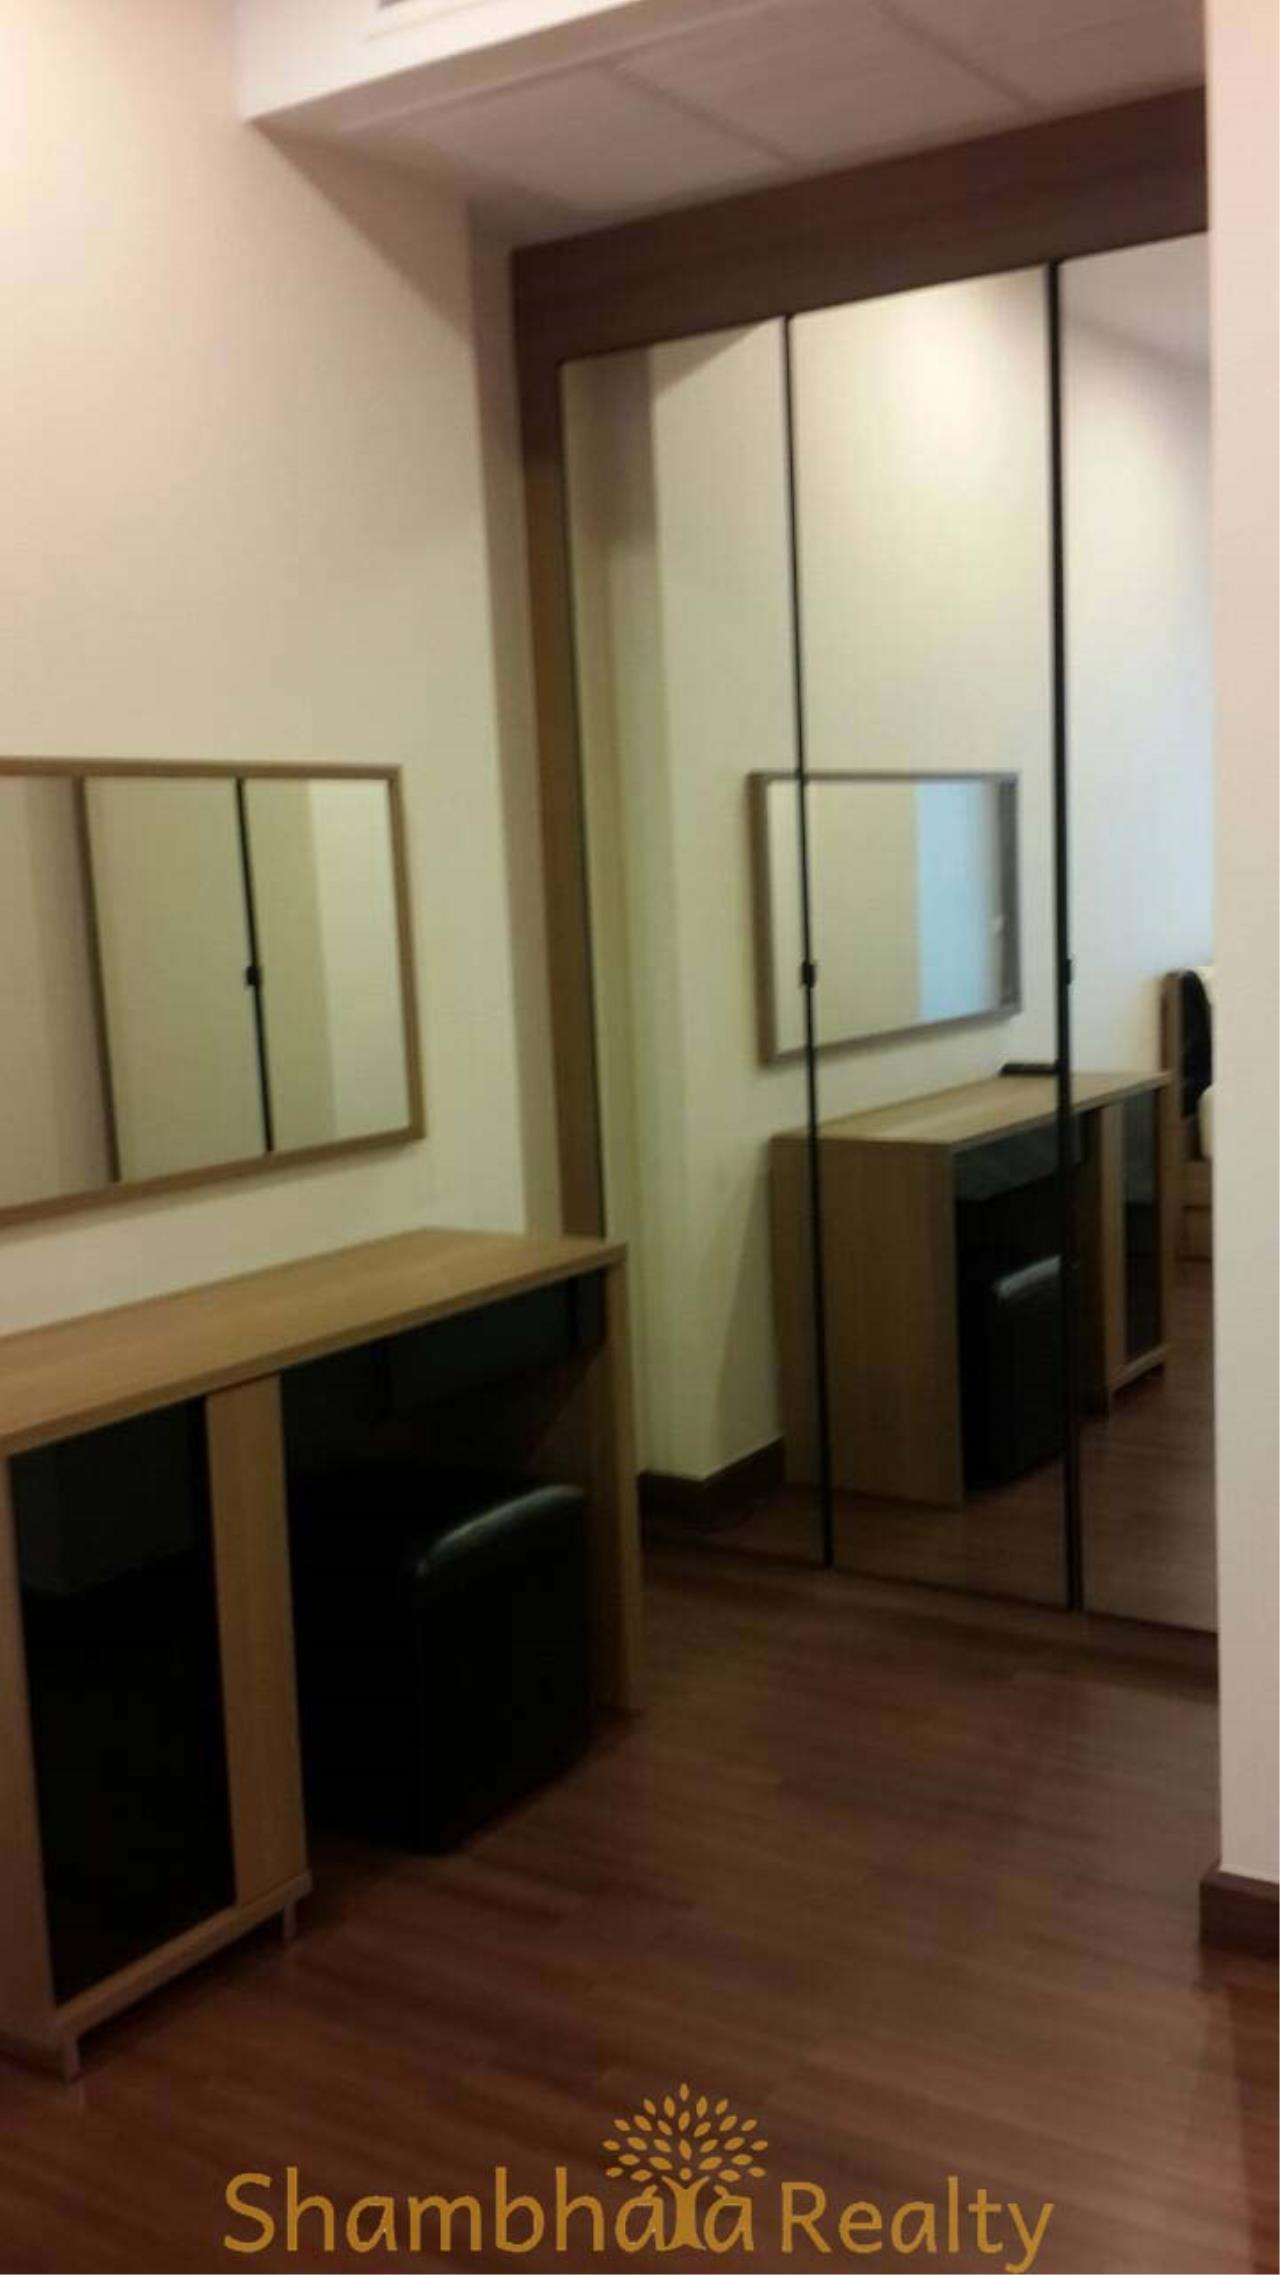 Shambhala Realty Agency's Supalai Lite Sathorn - Charoenrat Condominium for Rent in Sathorn - Charoen Rat 3